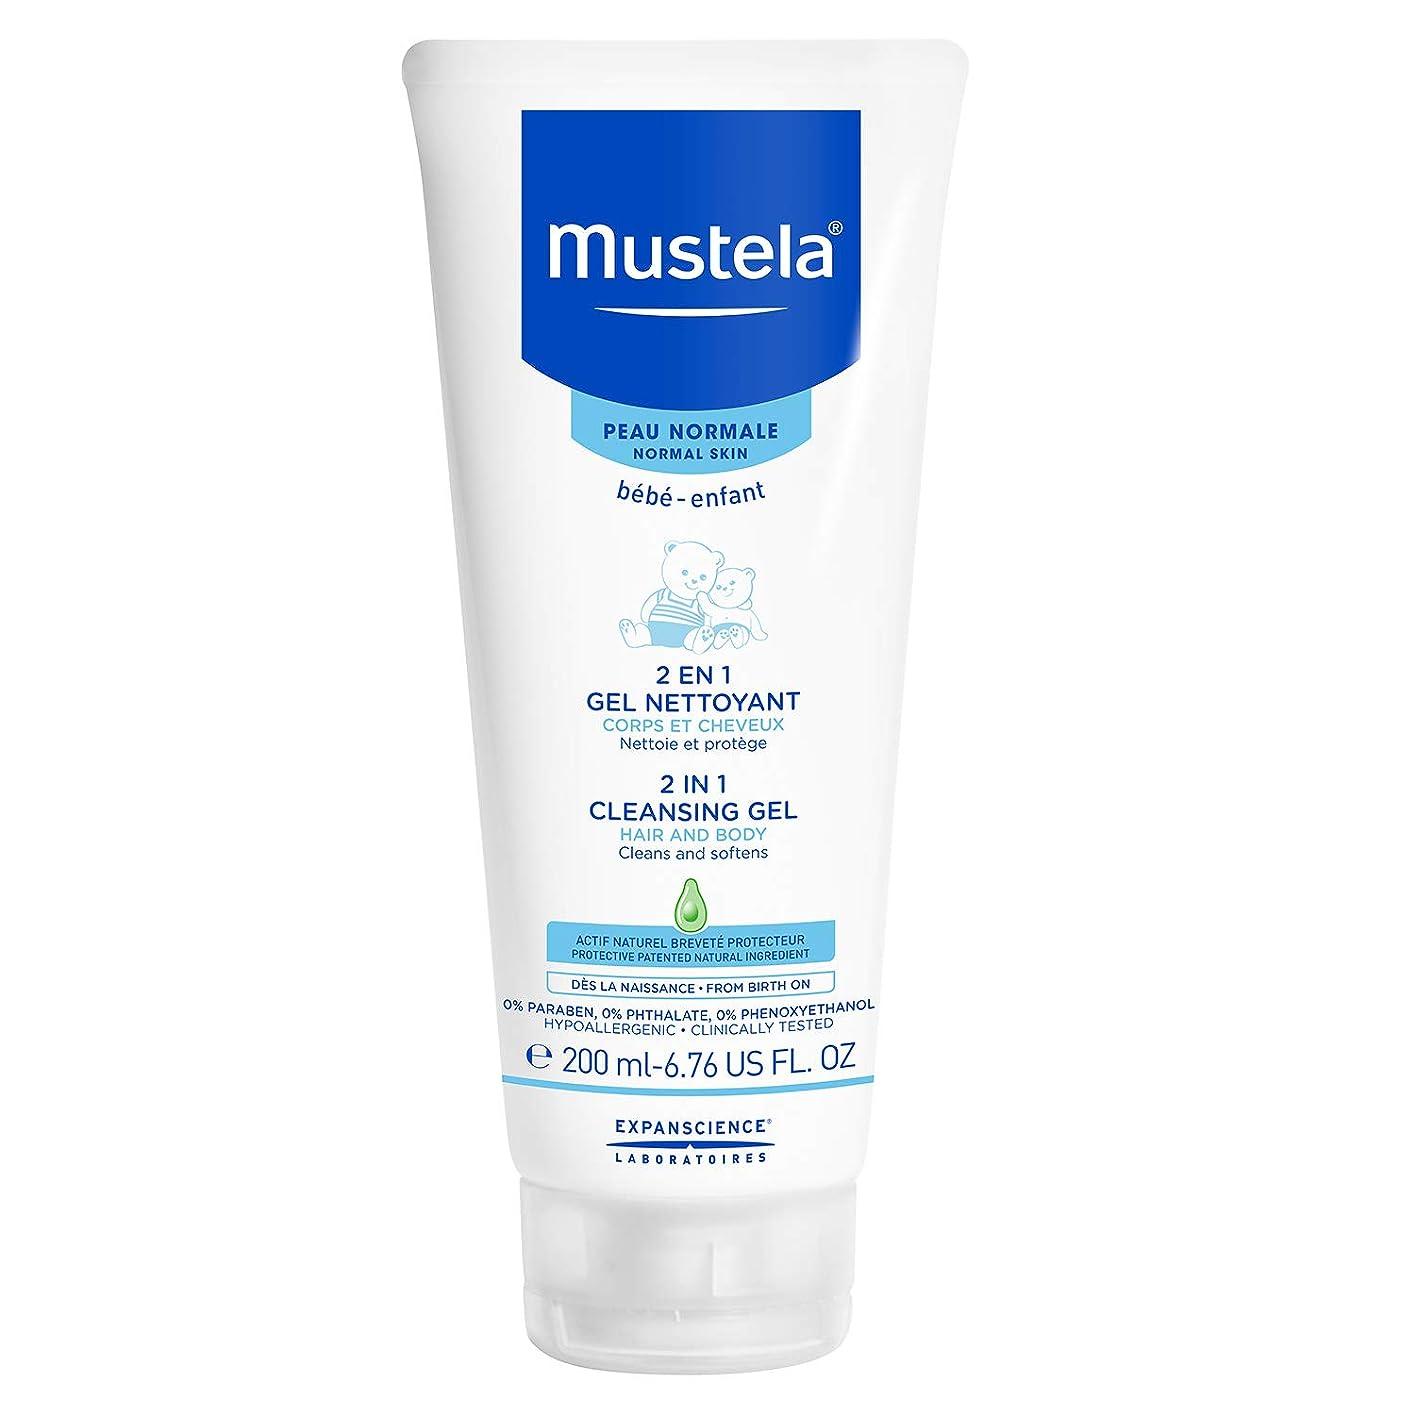 教孤独血統Mustela - 2 in 1 Cleansing Gel (6.76 oz.)